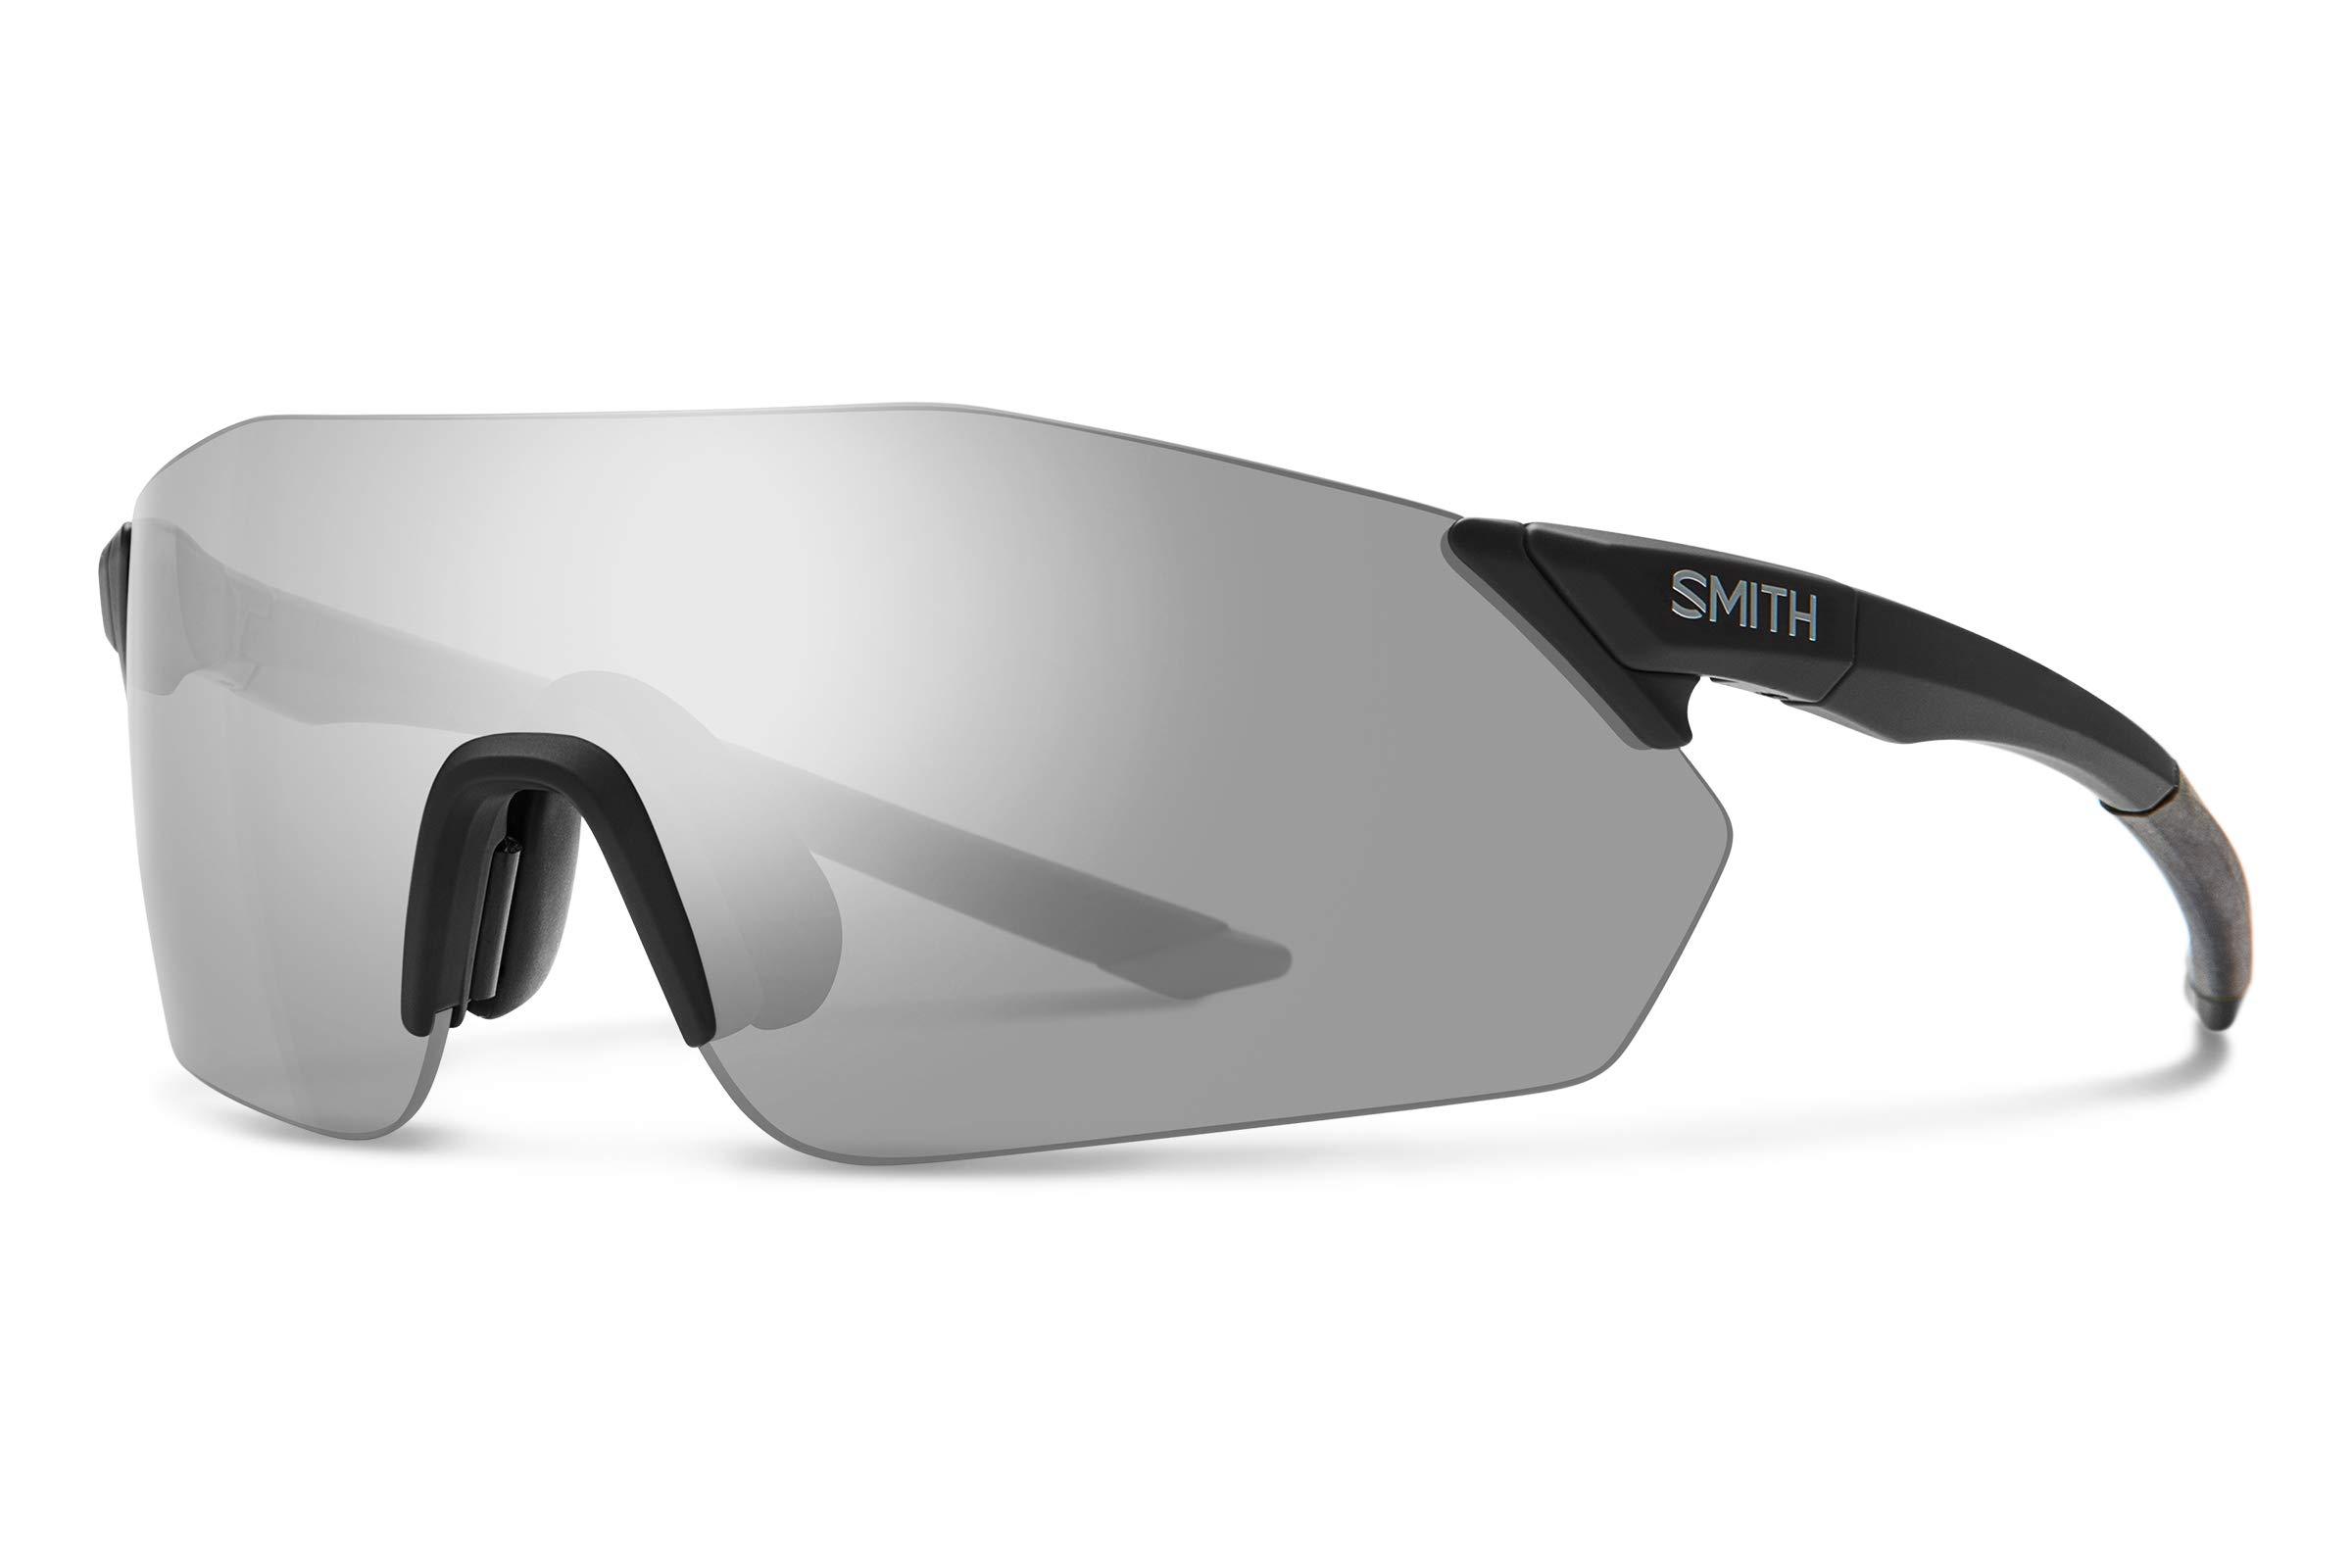 Smith Reverb Chromapop Sunglasses, Matte Black, Chromapop Platinum/Contrast Rose